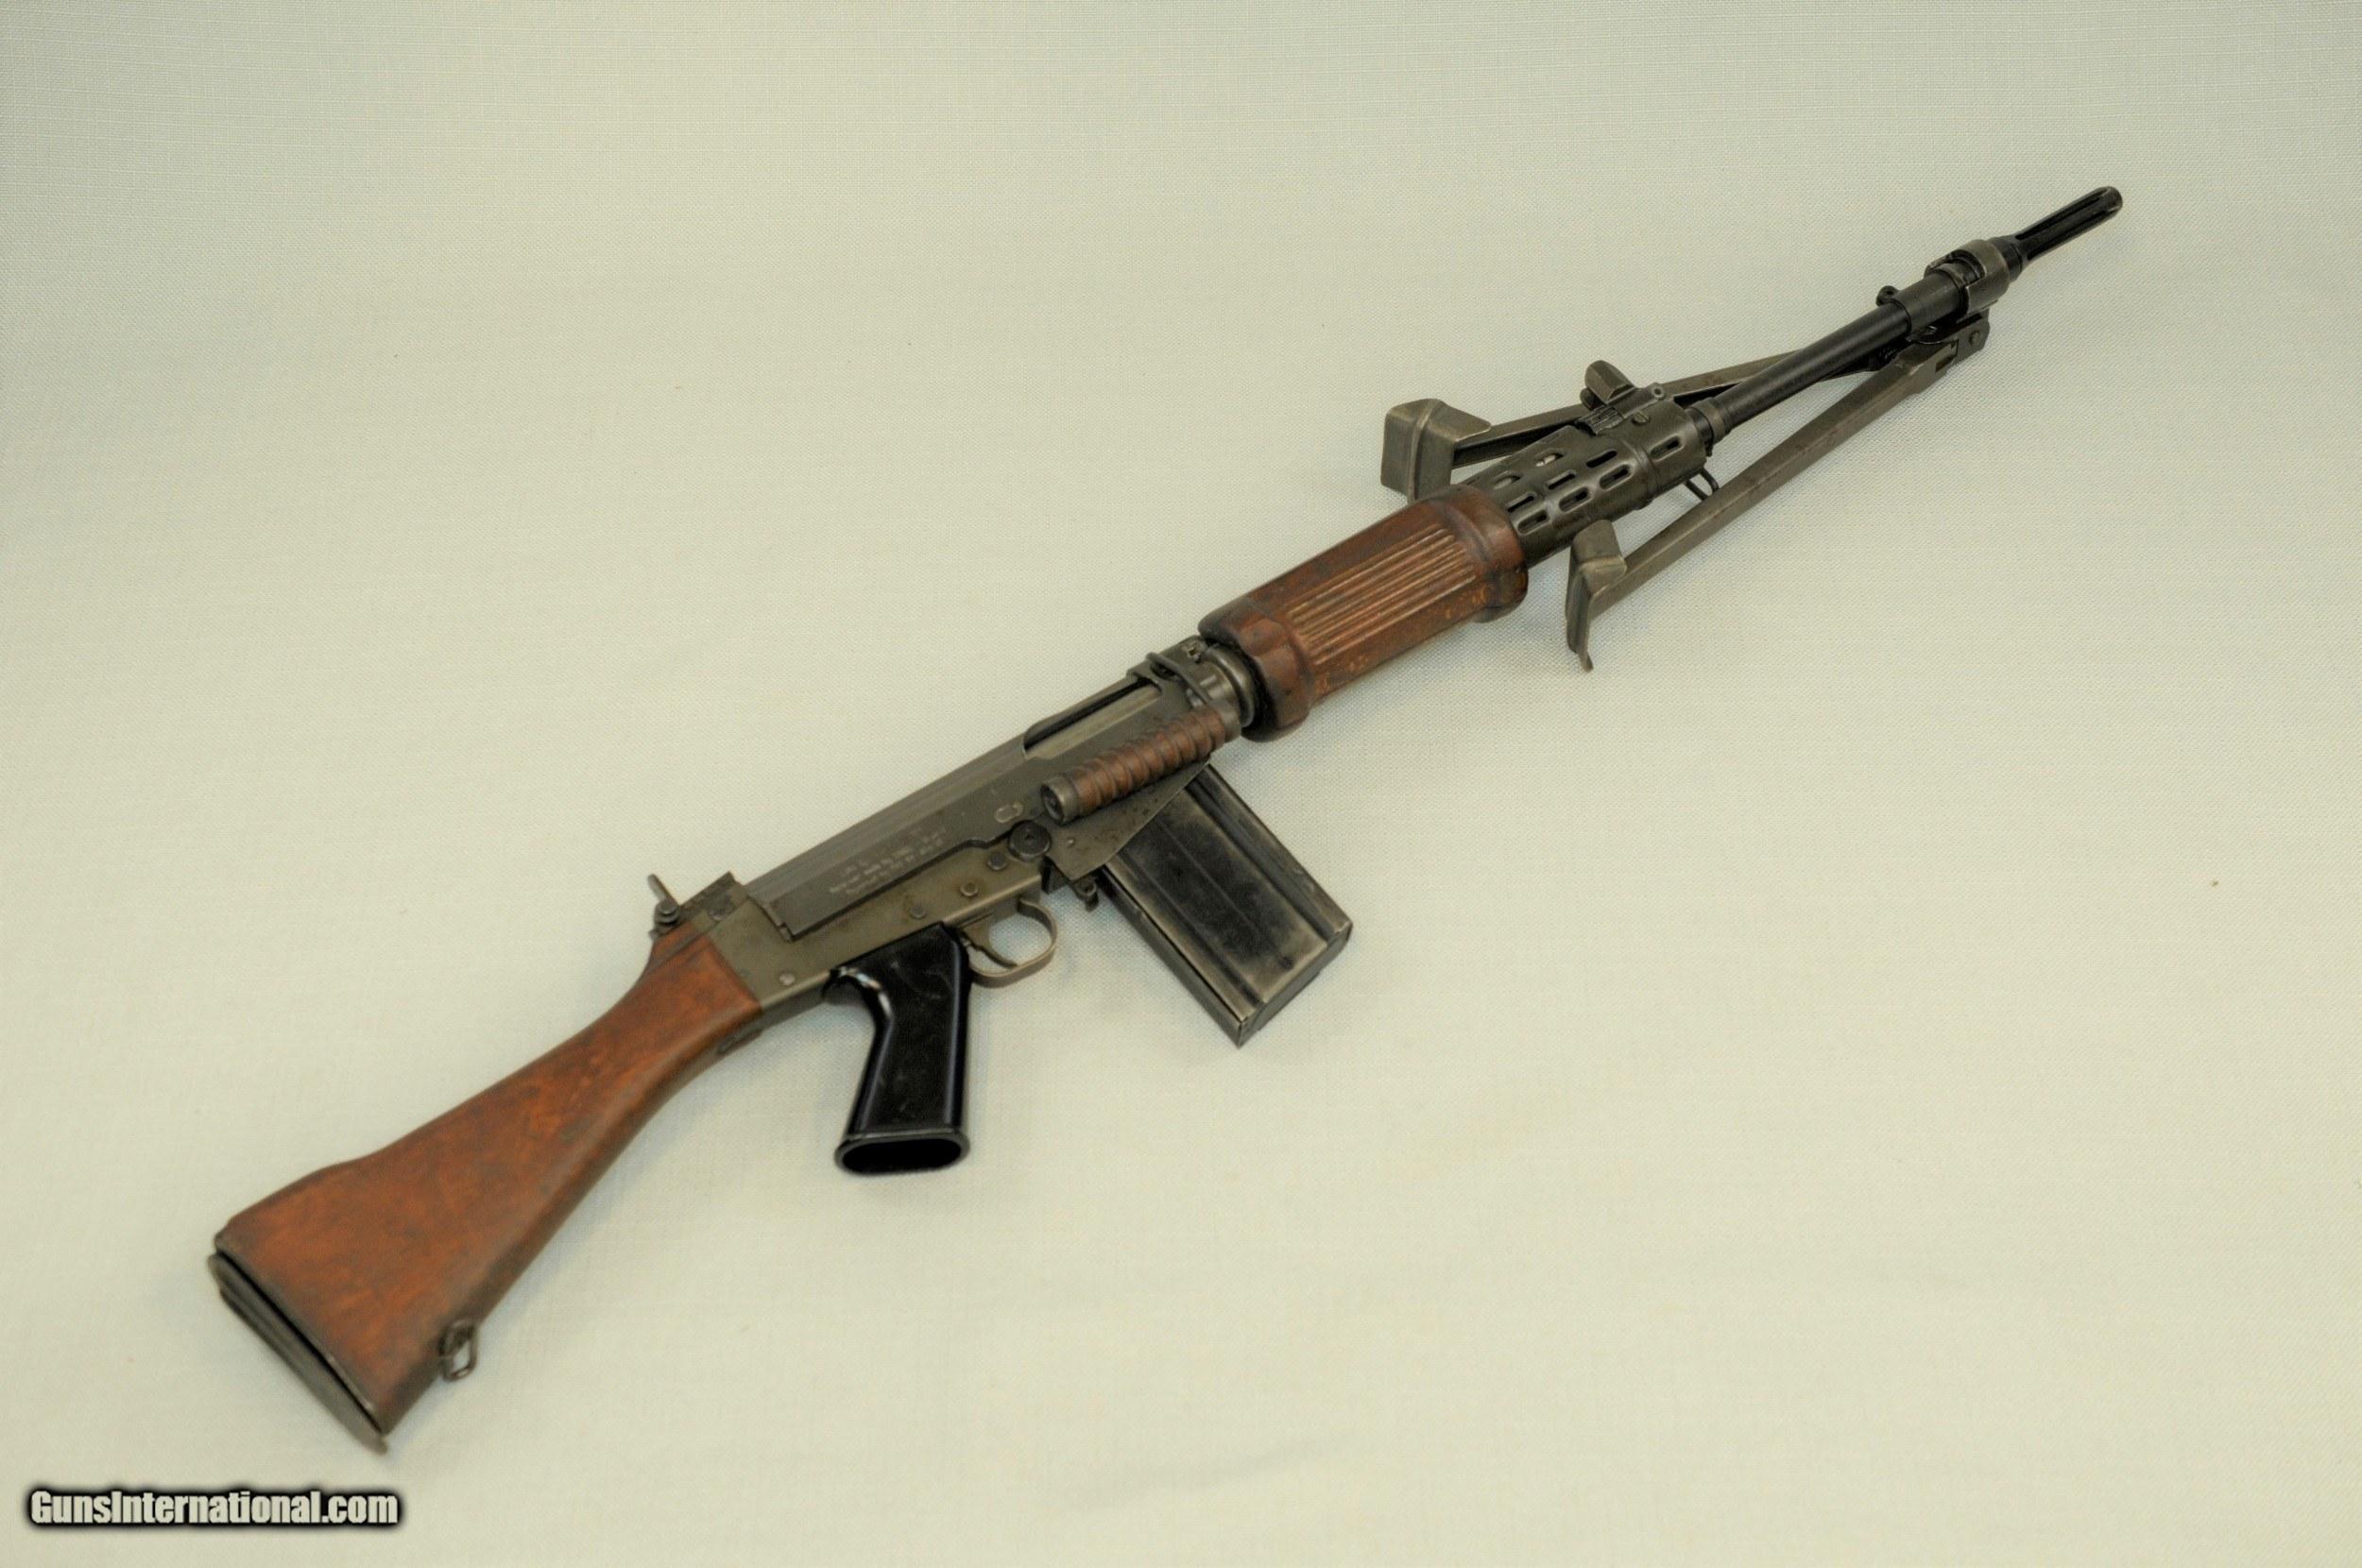 FN FAL , MODEL: L1A1 , CALIBER: 7.62 X 51 - Switzers